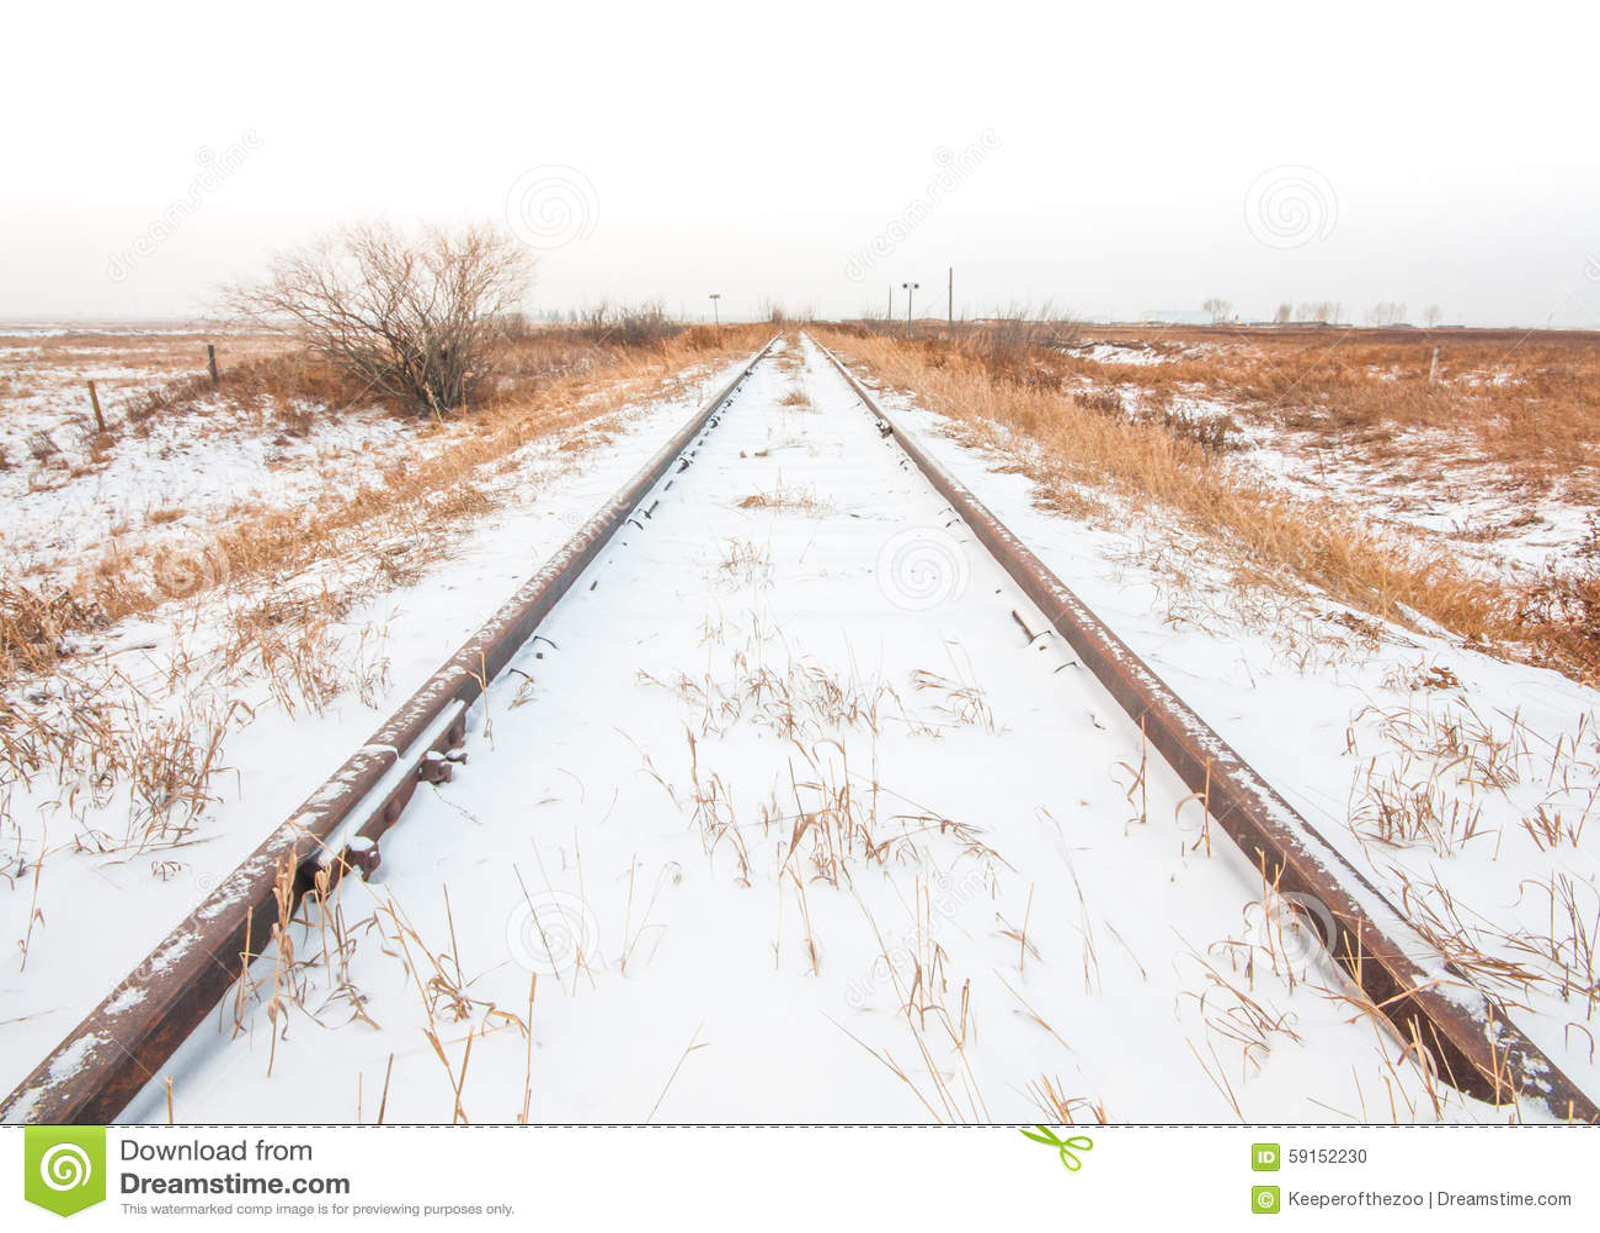 Landscape of Snowy Train Tracks